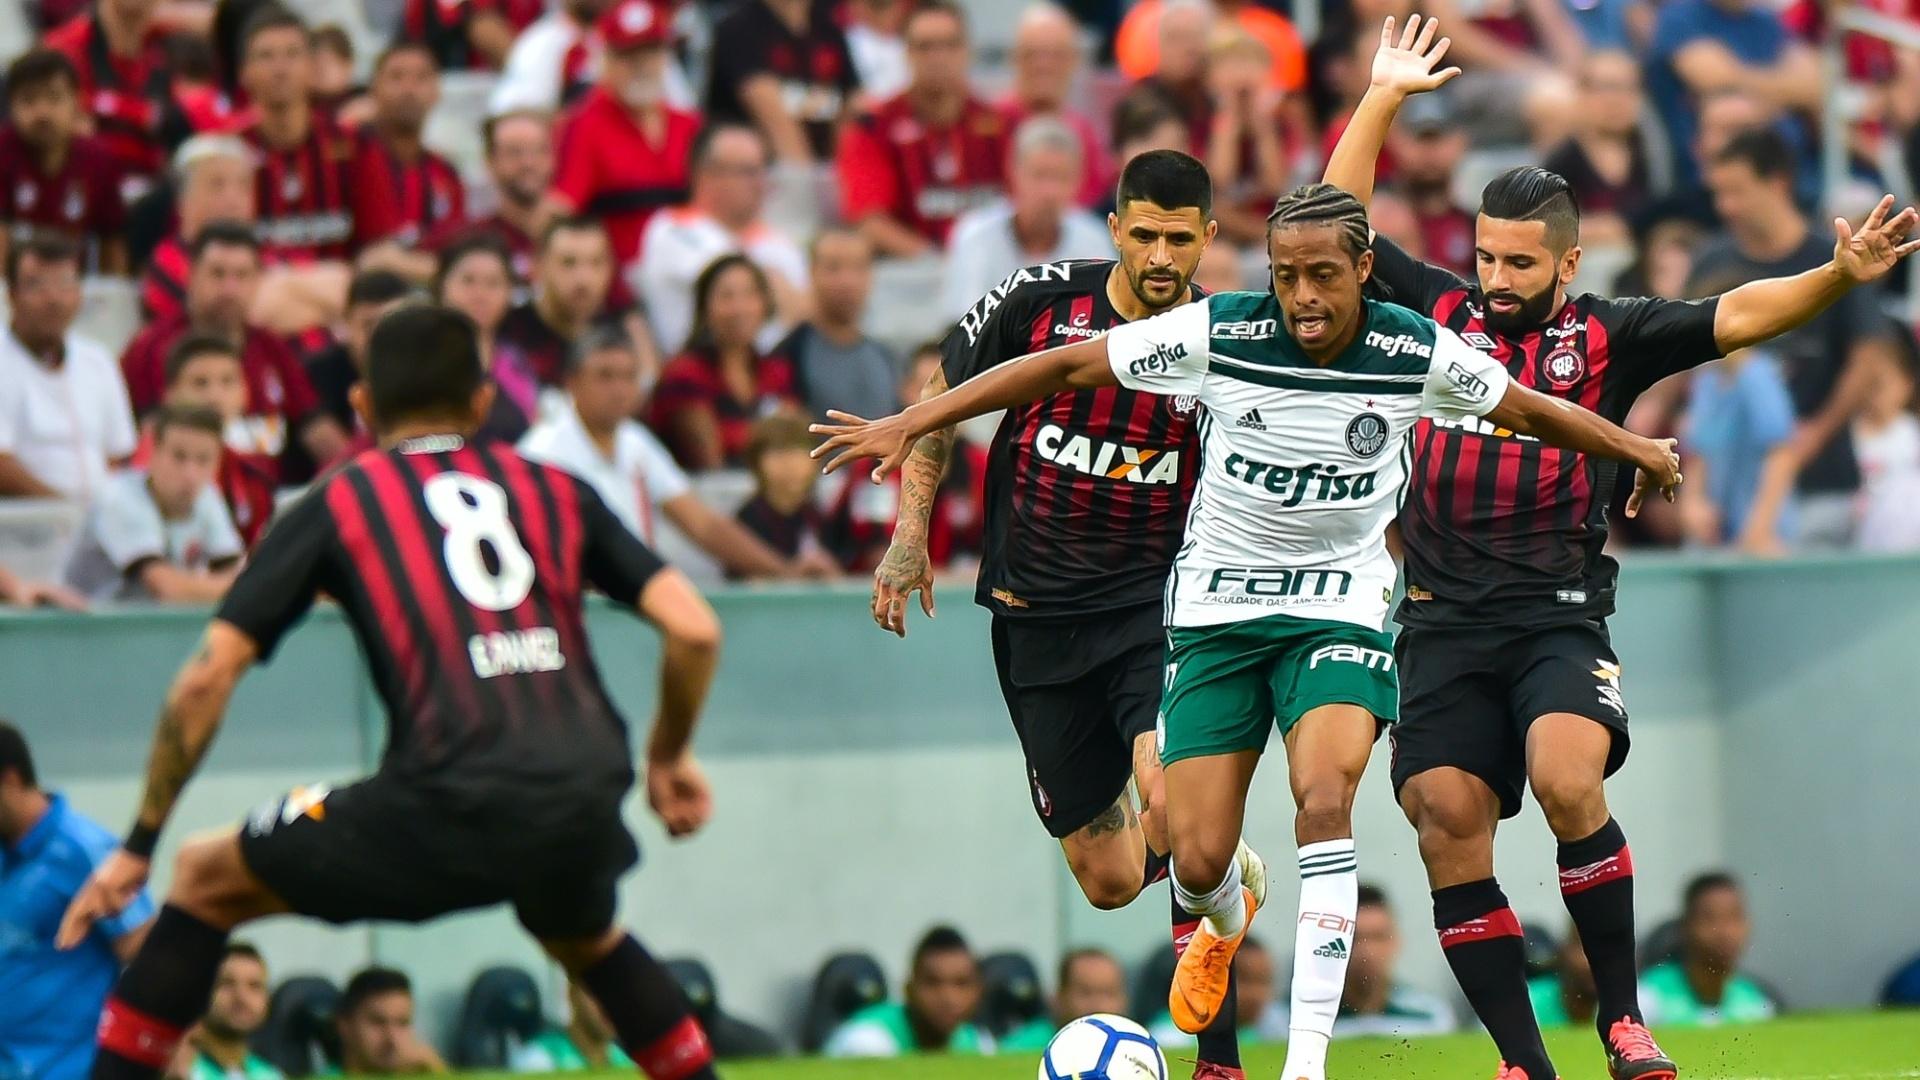 Keno é marcado por dois jogadores durante a partida entre Atlético-PR e Palmeiras